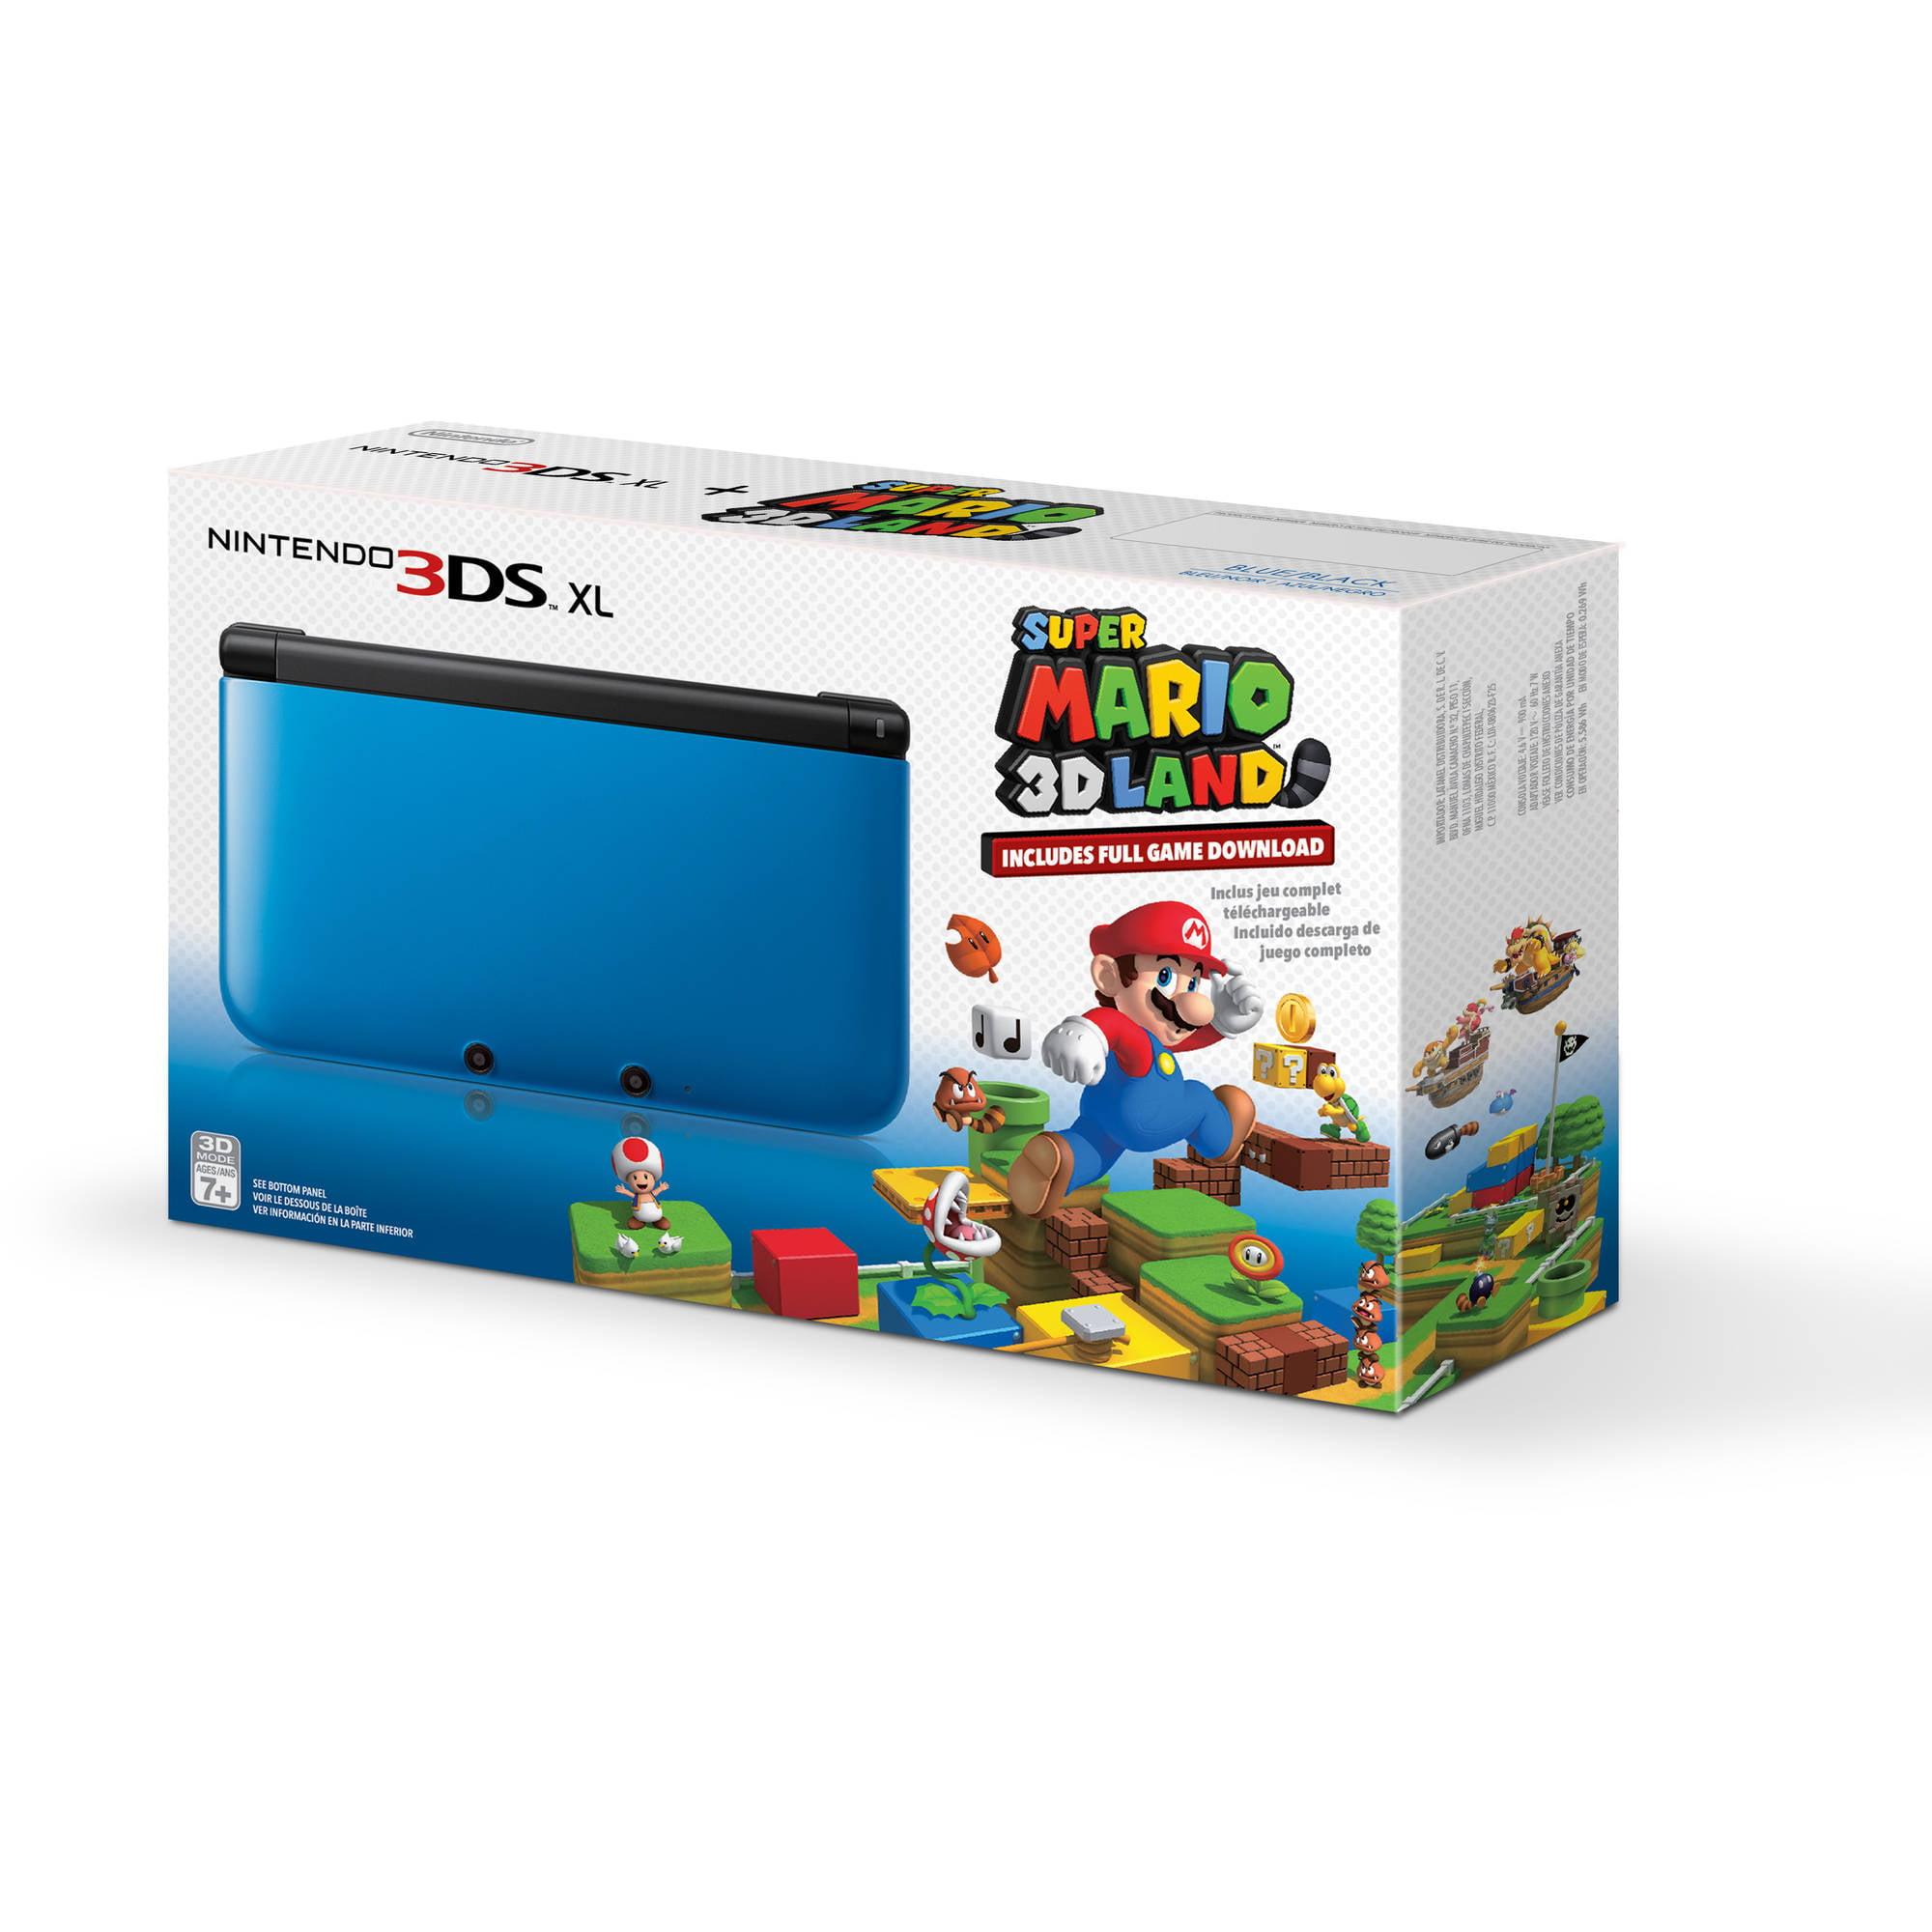 Nintendo 3DS XL Handheld Console with Super Mario 3D Land, Blue